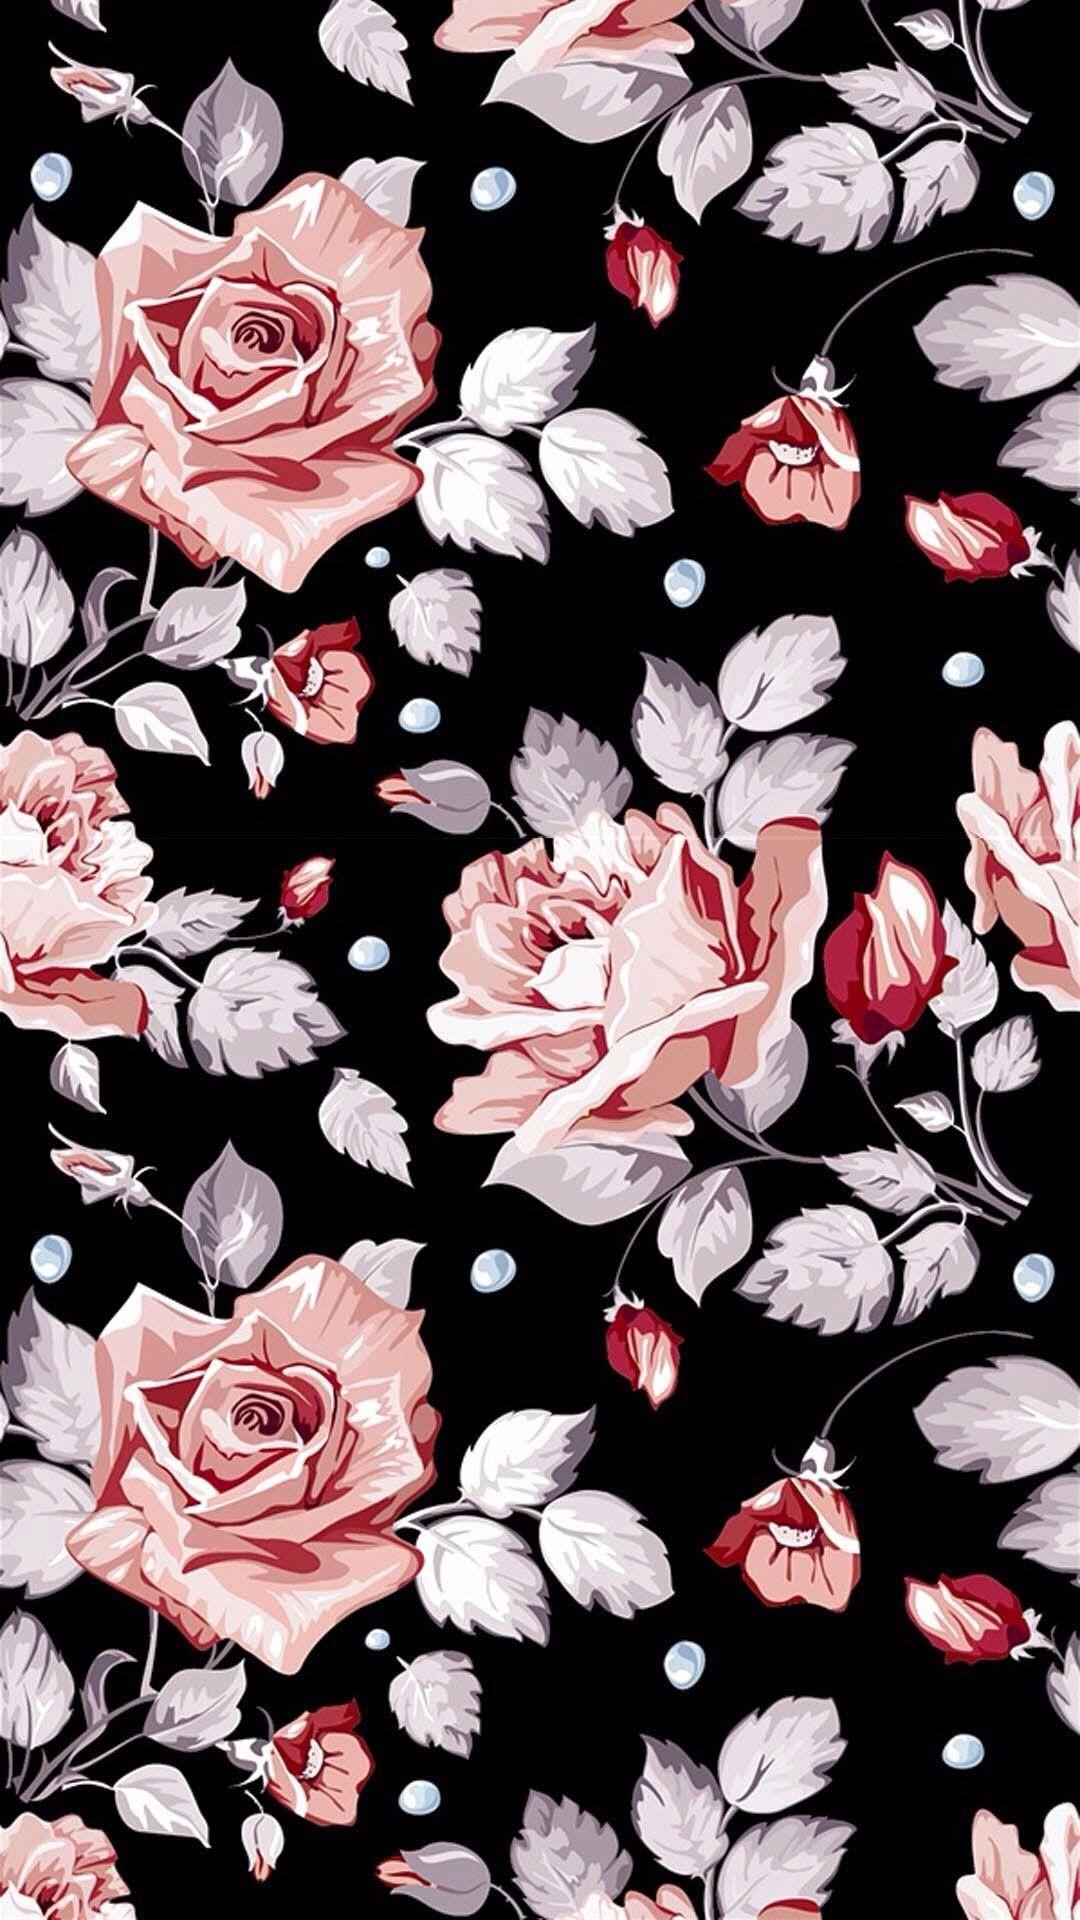 Floral iphone 6s plus wallpaper